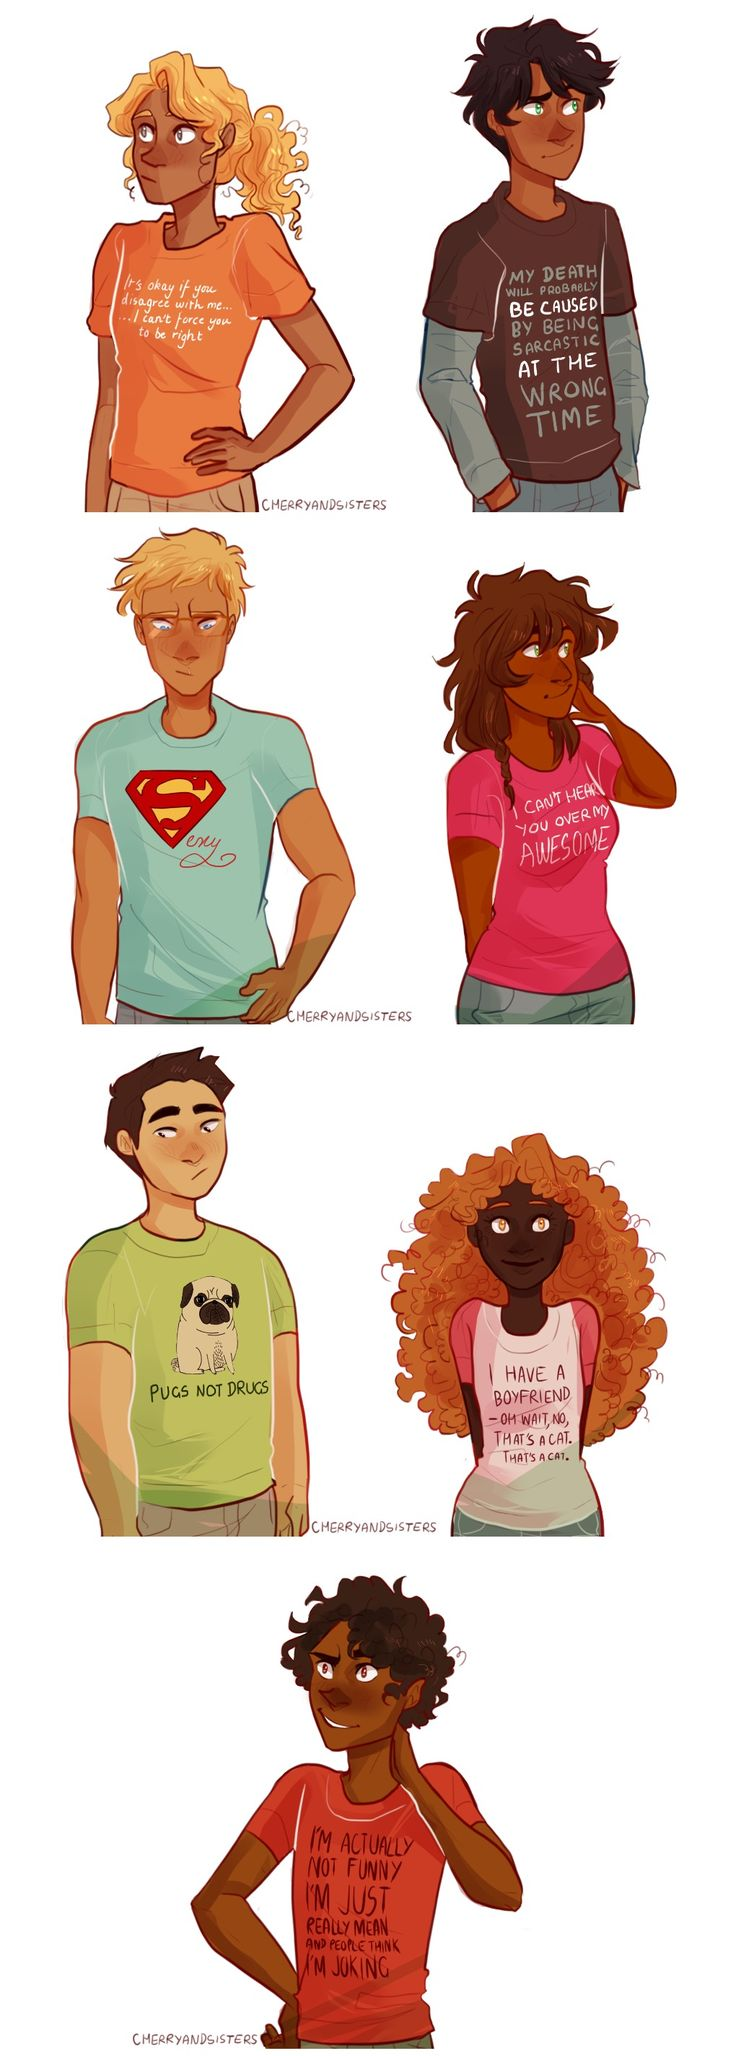 I like Percy's shirt. It so fits him.